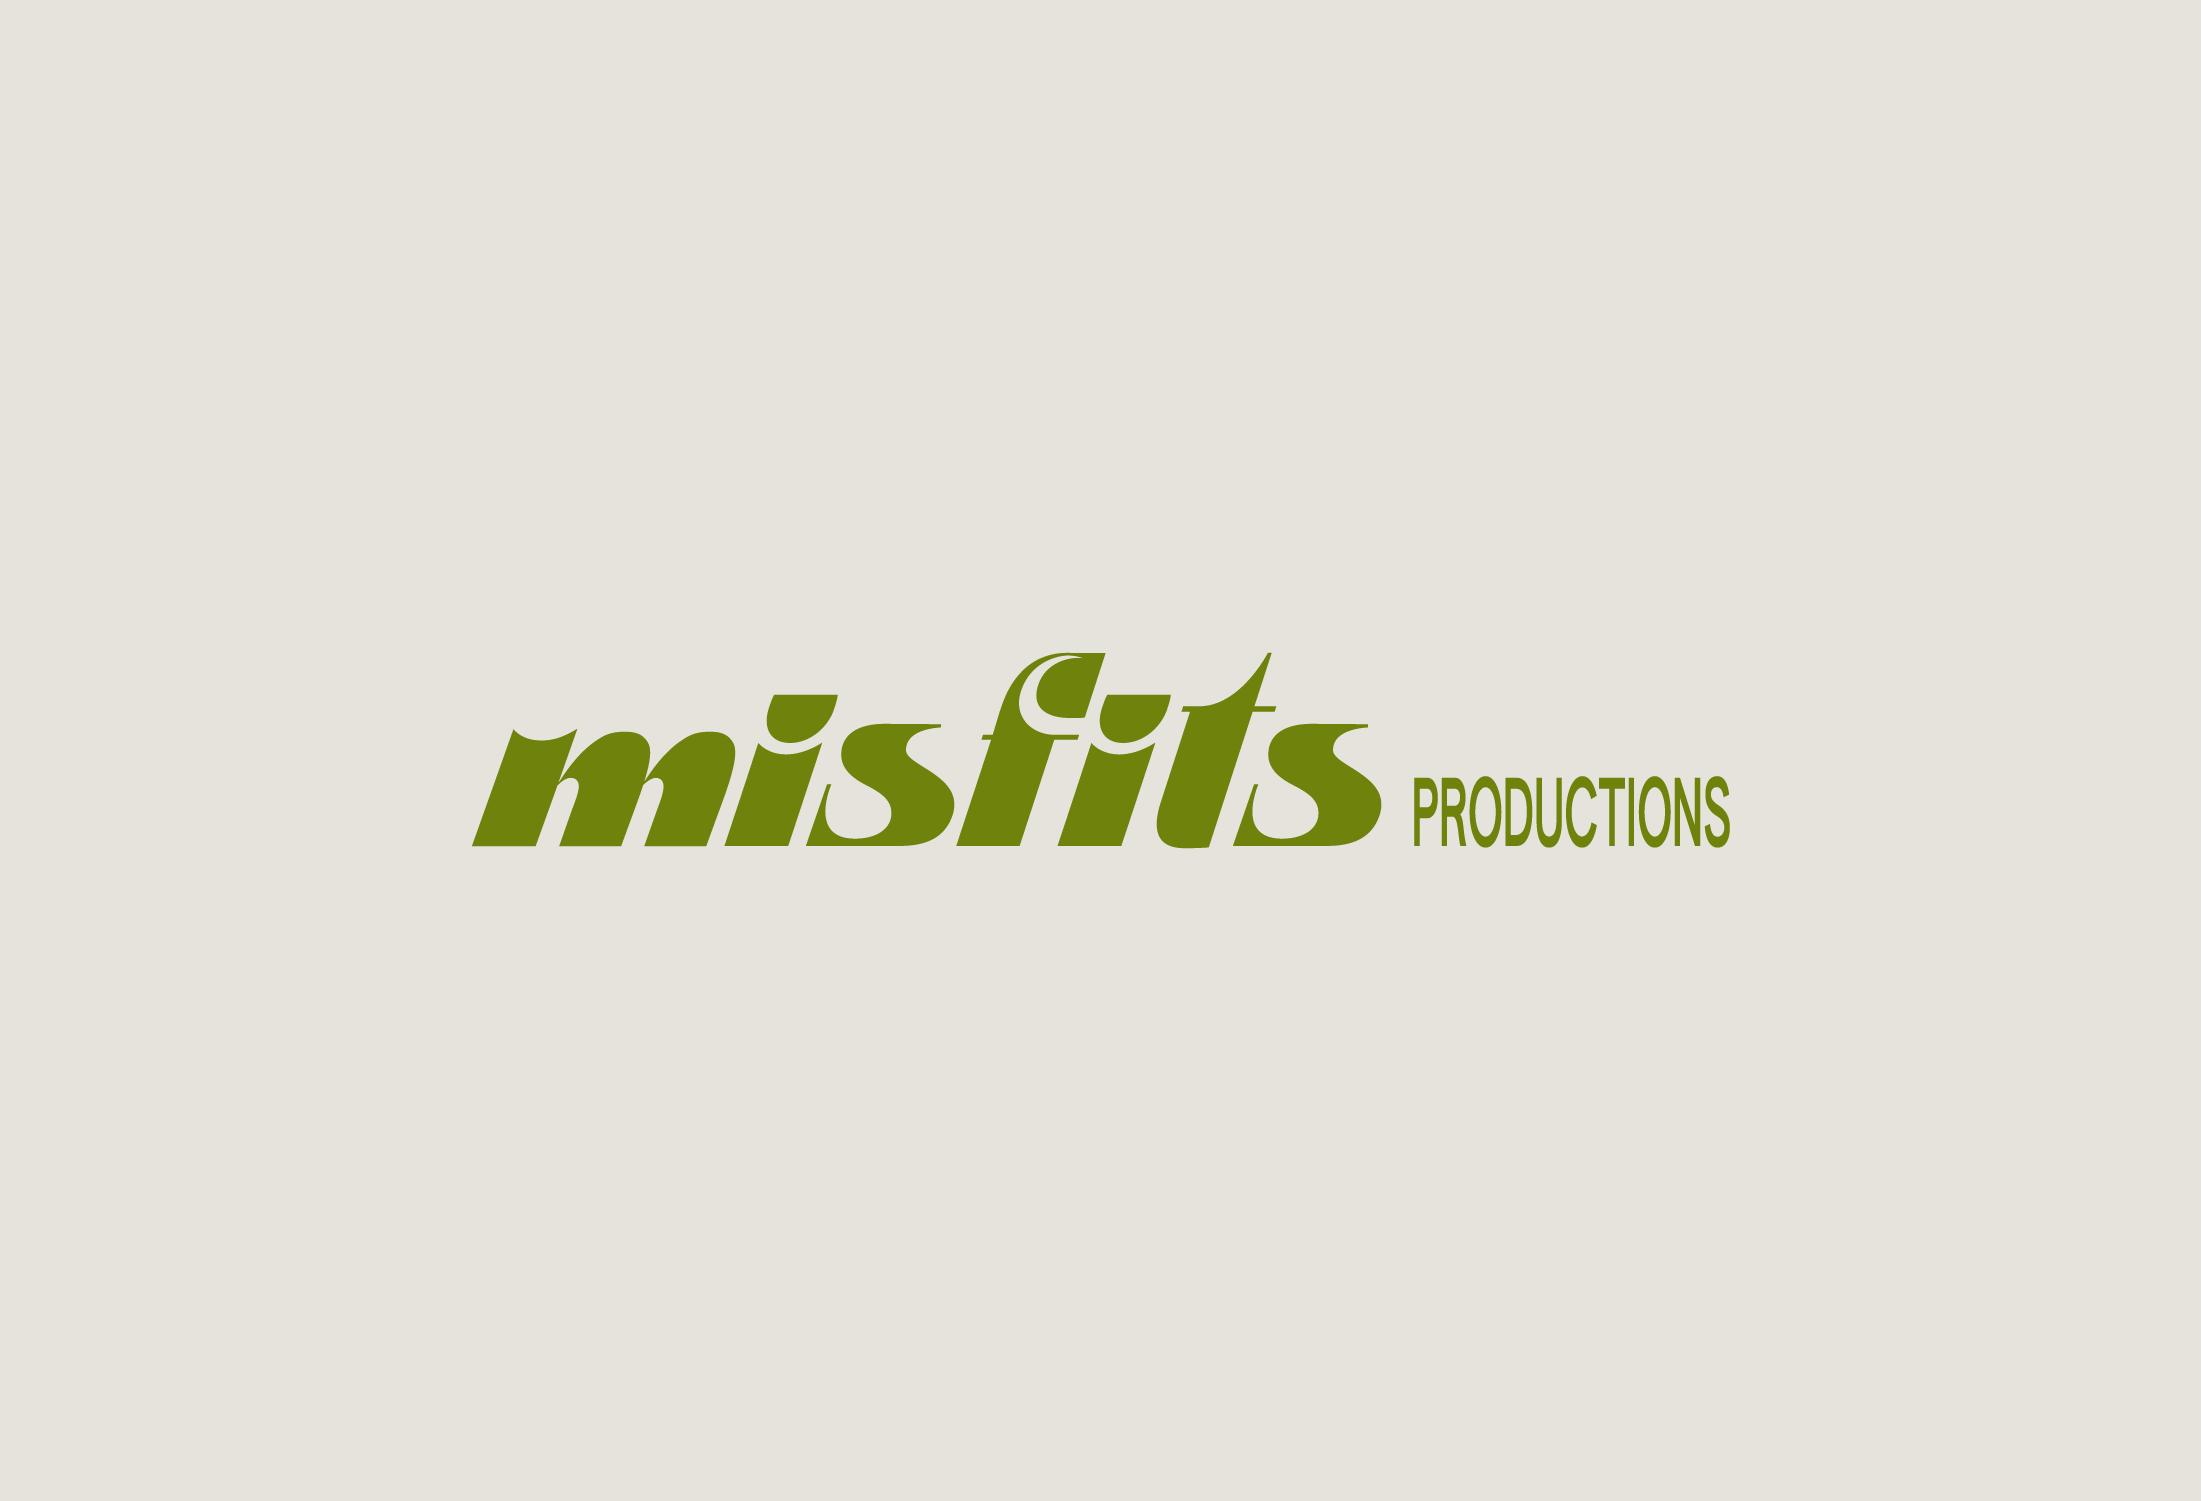 MSFTS_Sec_Logo_1_